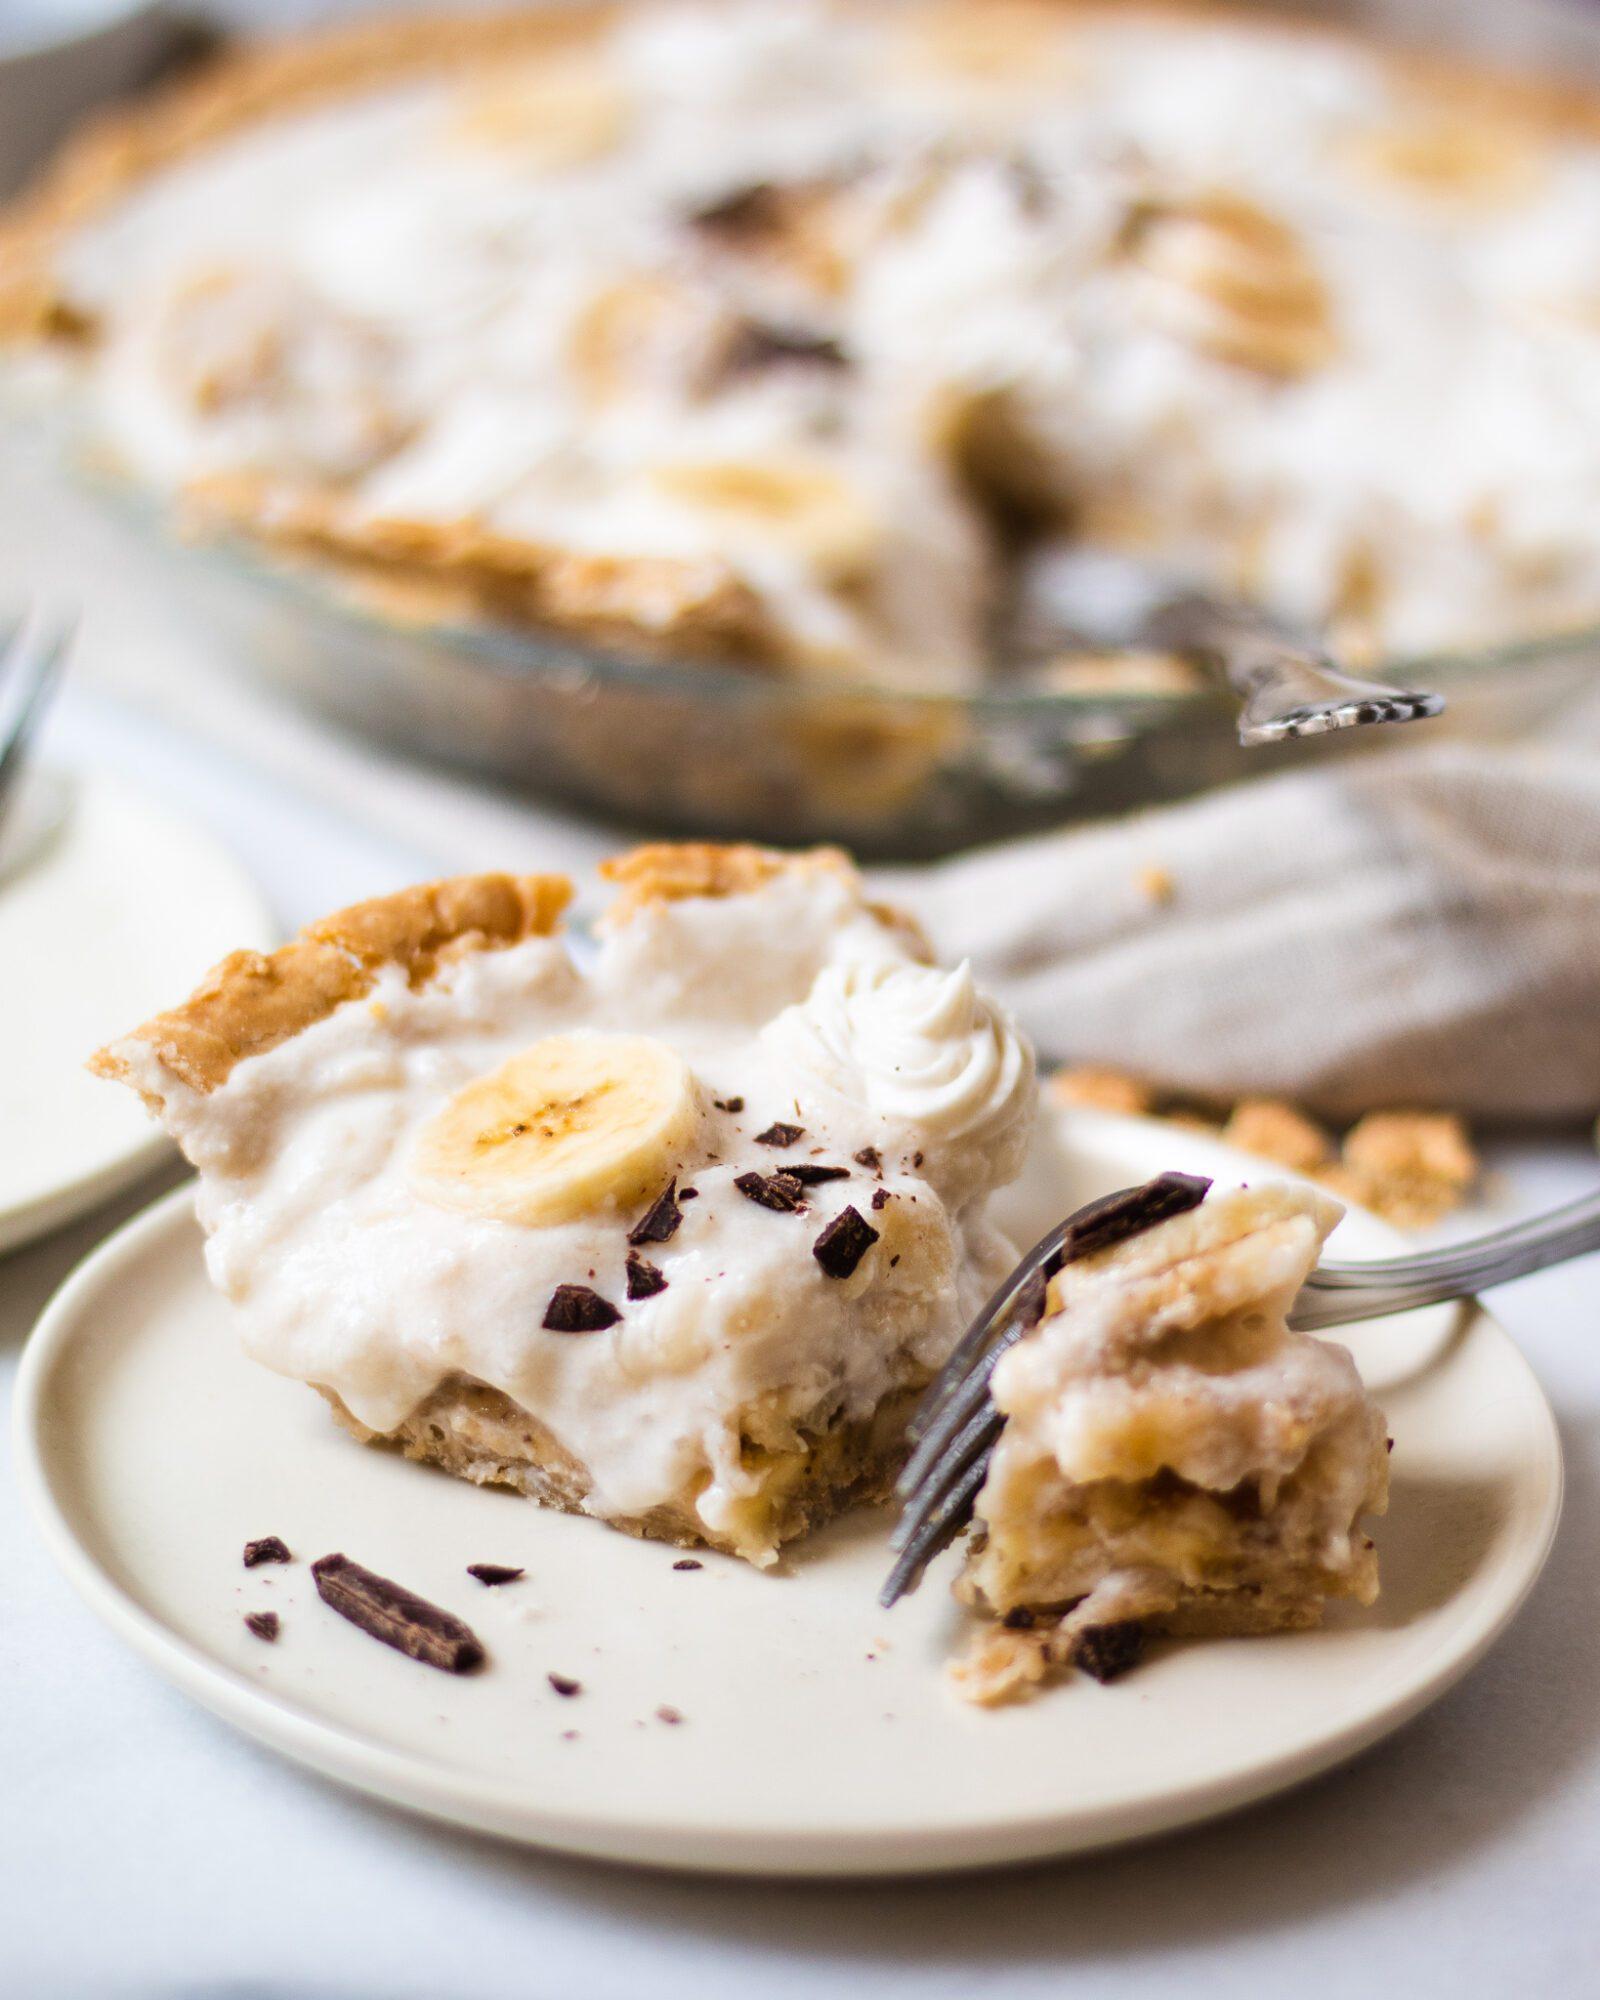 piece of banana cream pie being eaten